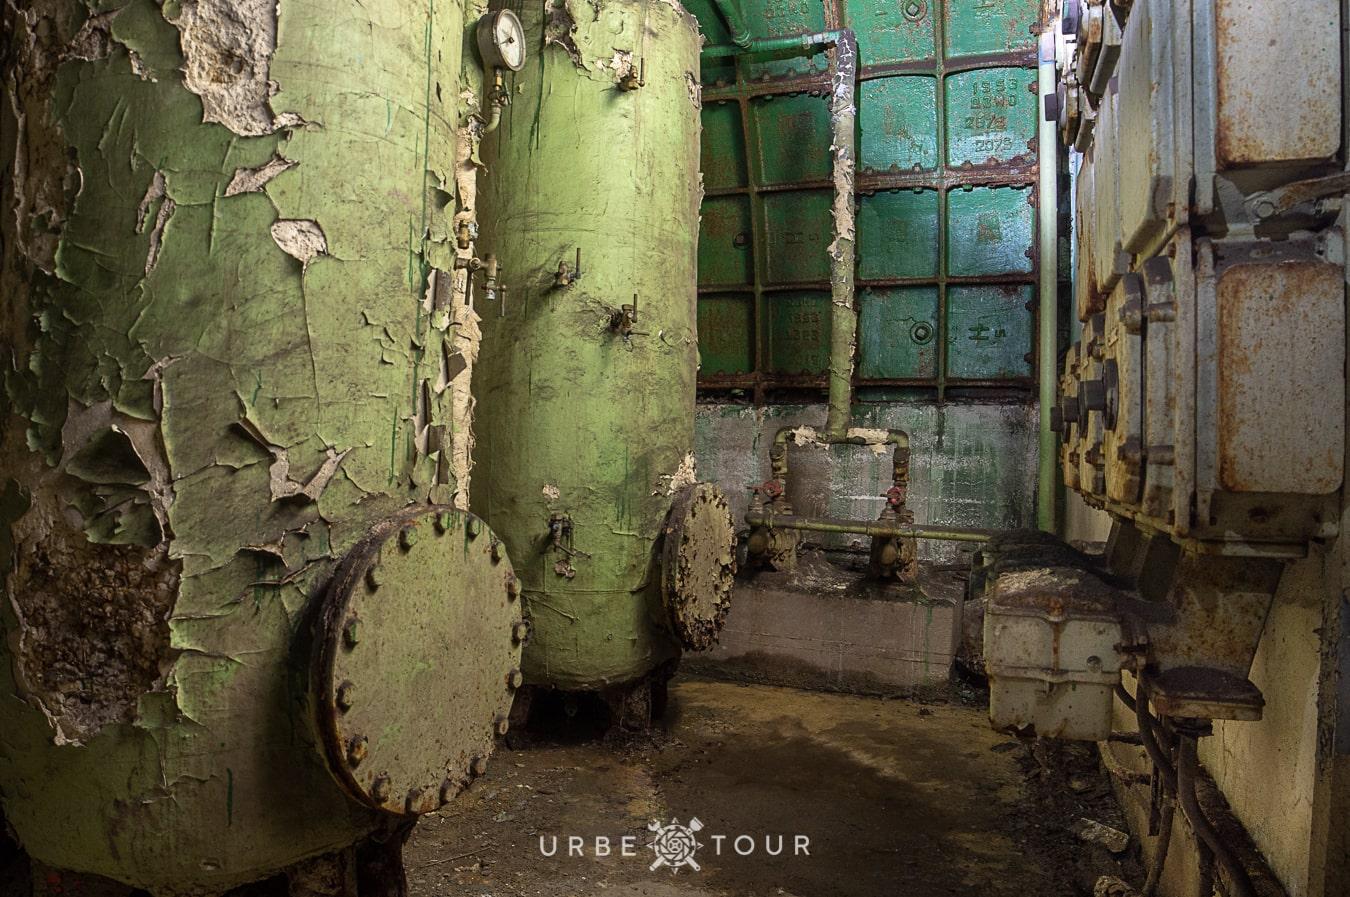 F-4-Rakosi-Bunker-budapest-17 Спецобъект Ф-4 - бункер коммуниста Ракоси в центре Будапешта